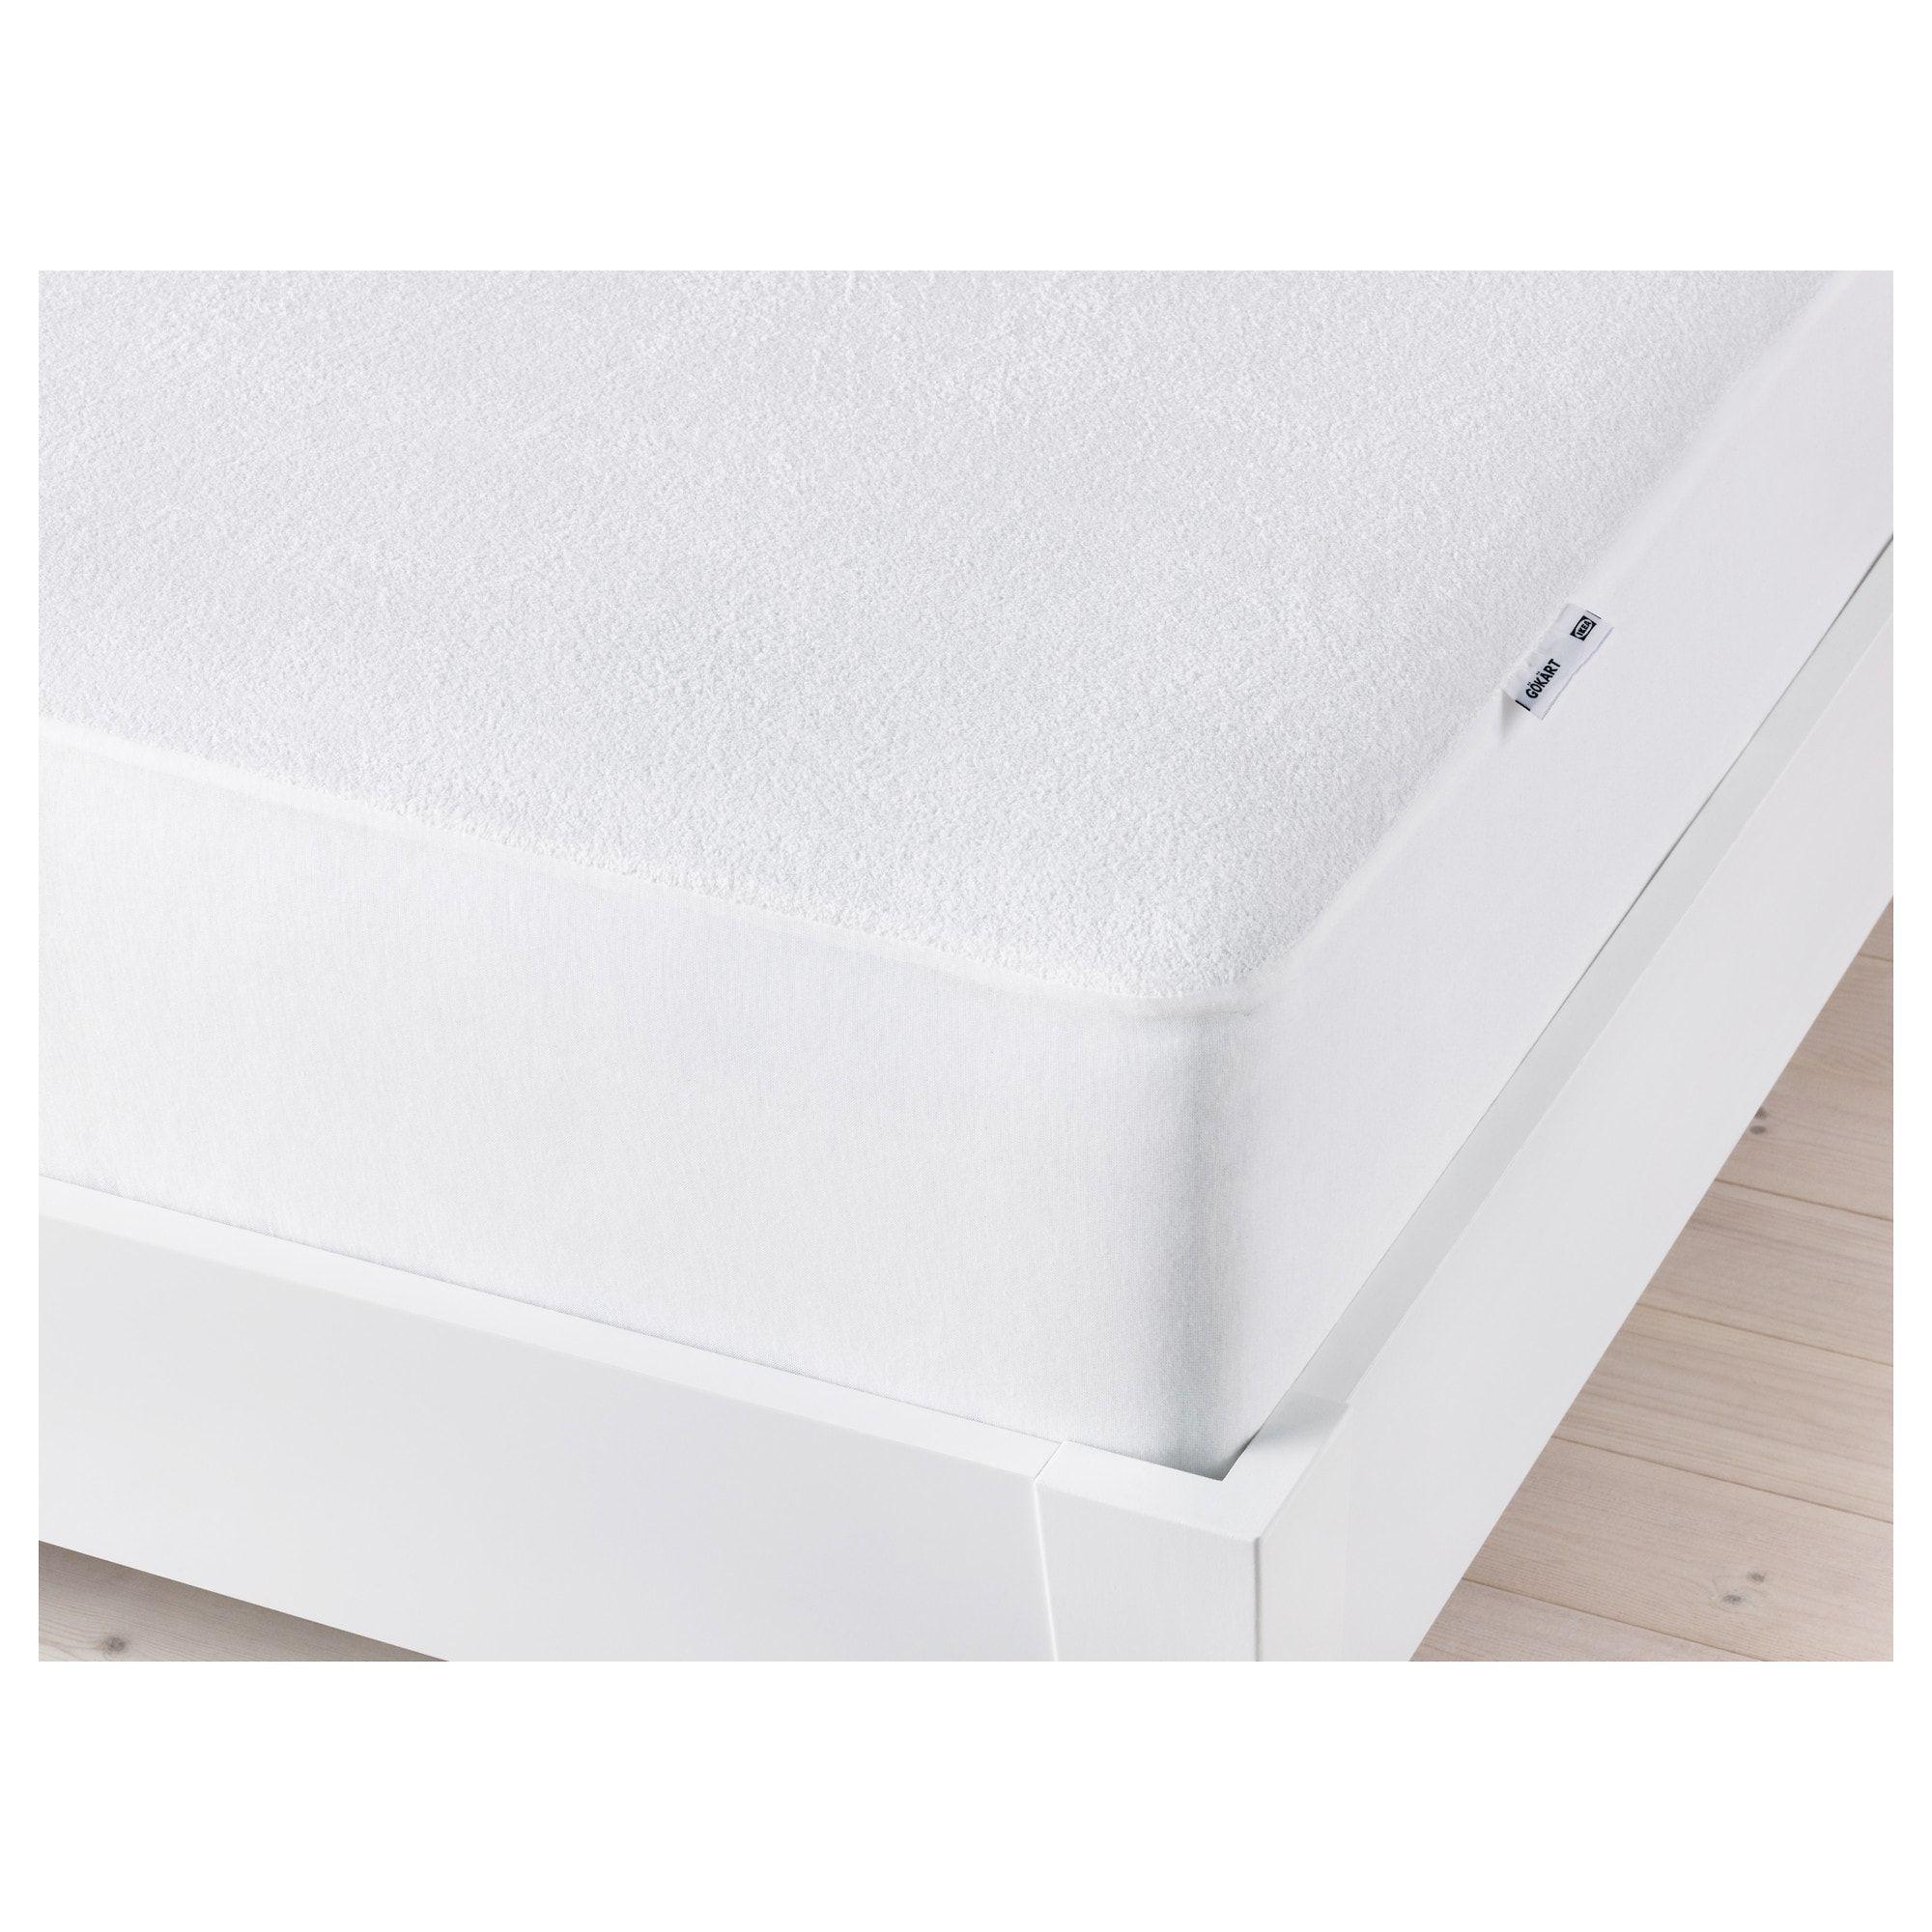 Gokart Proteggi Materasso 90x200 Cm Ikea It Mattress Mattress Protector Bed Frame With Storage